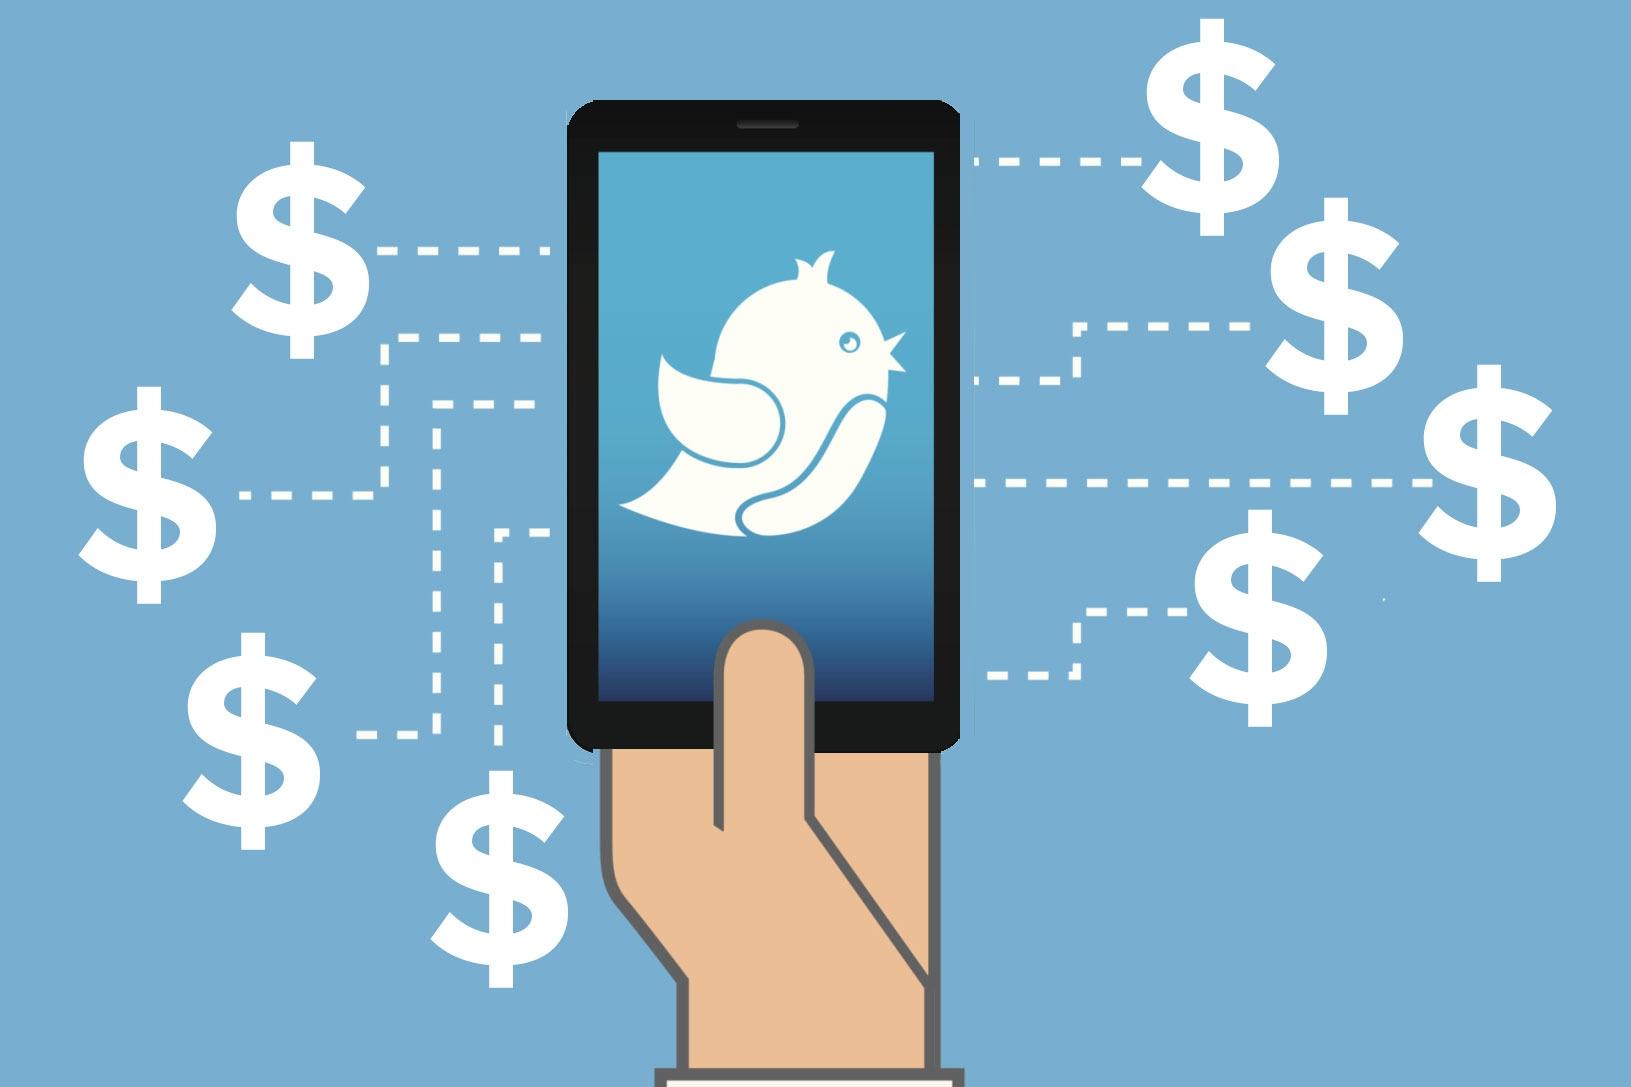 Hachette will start selling books straight from Twitter